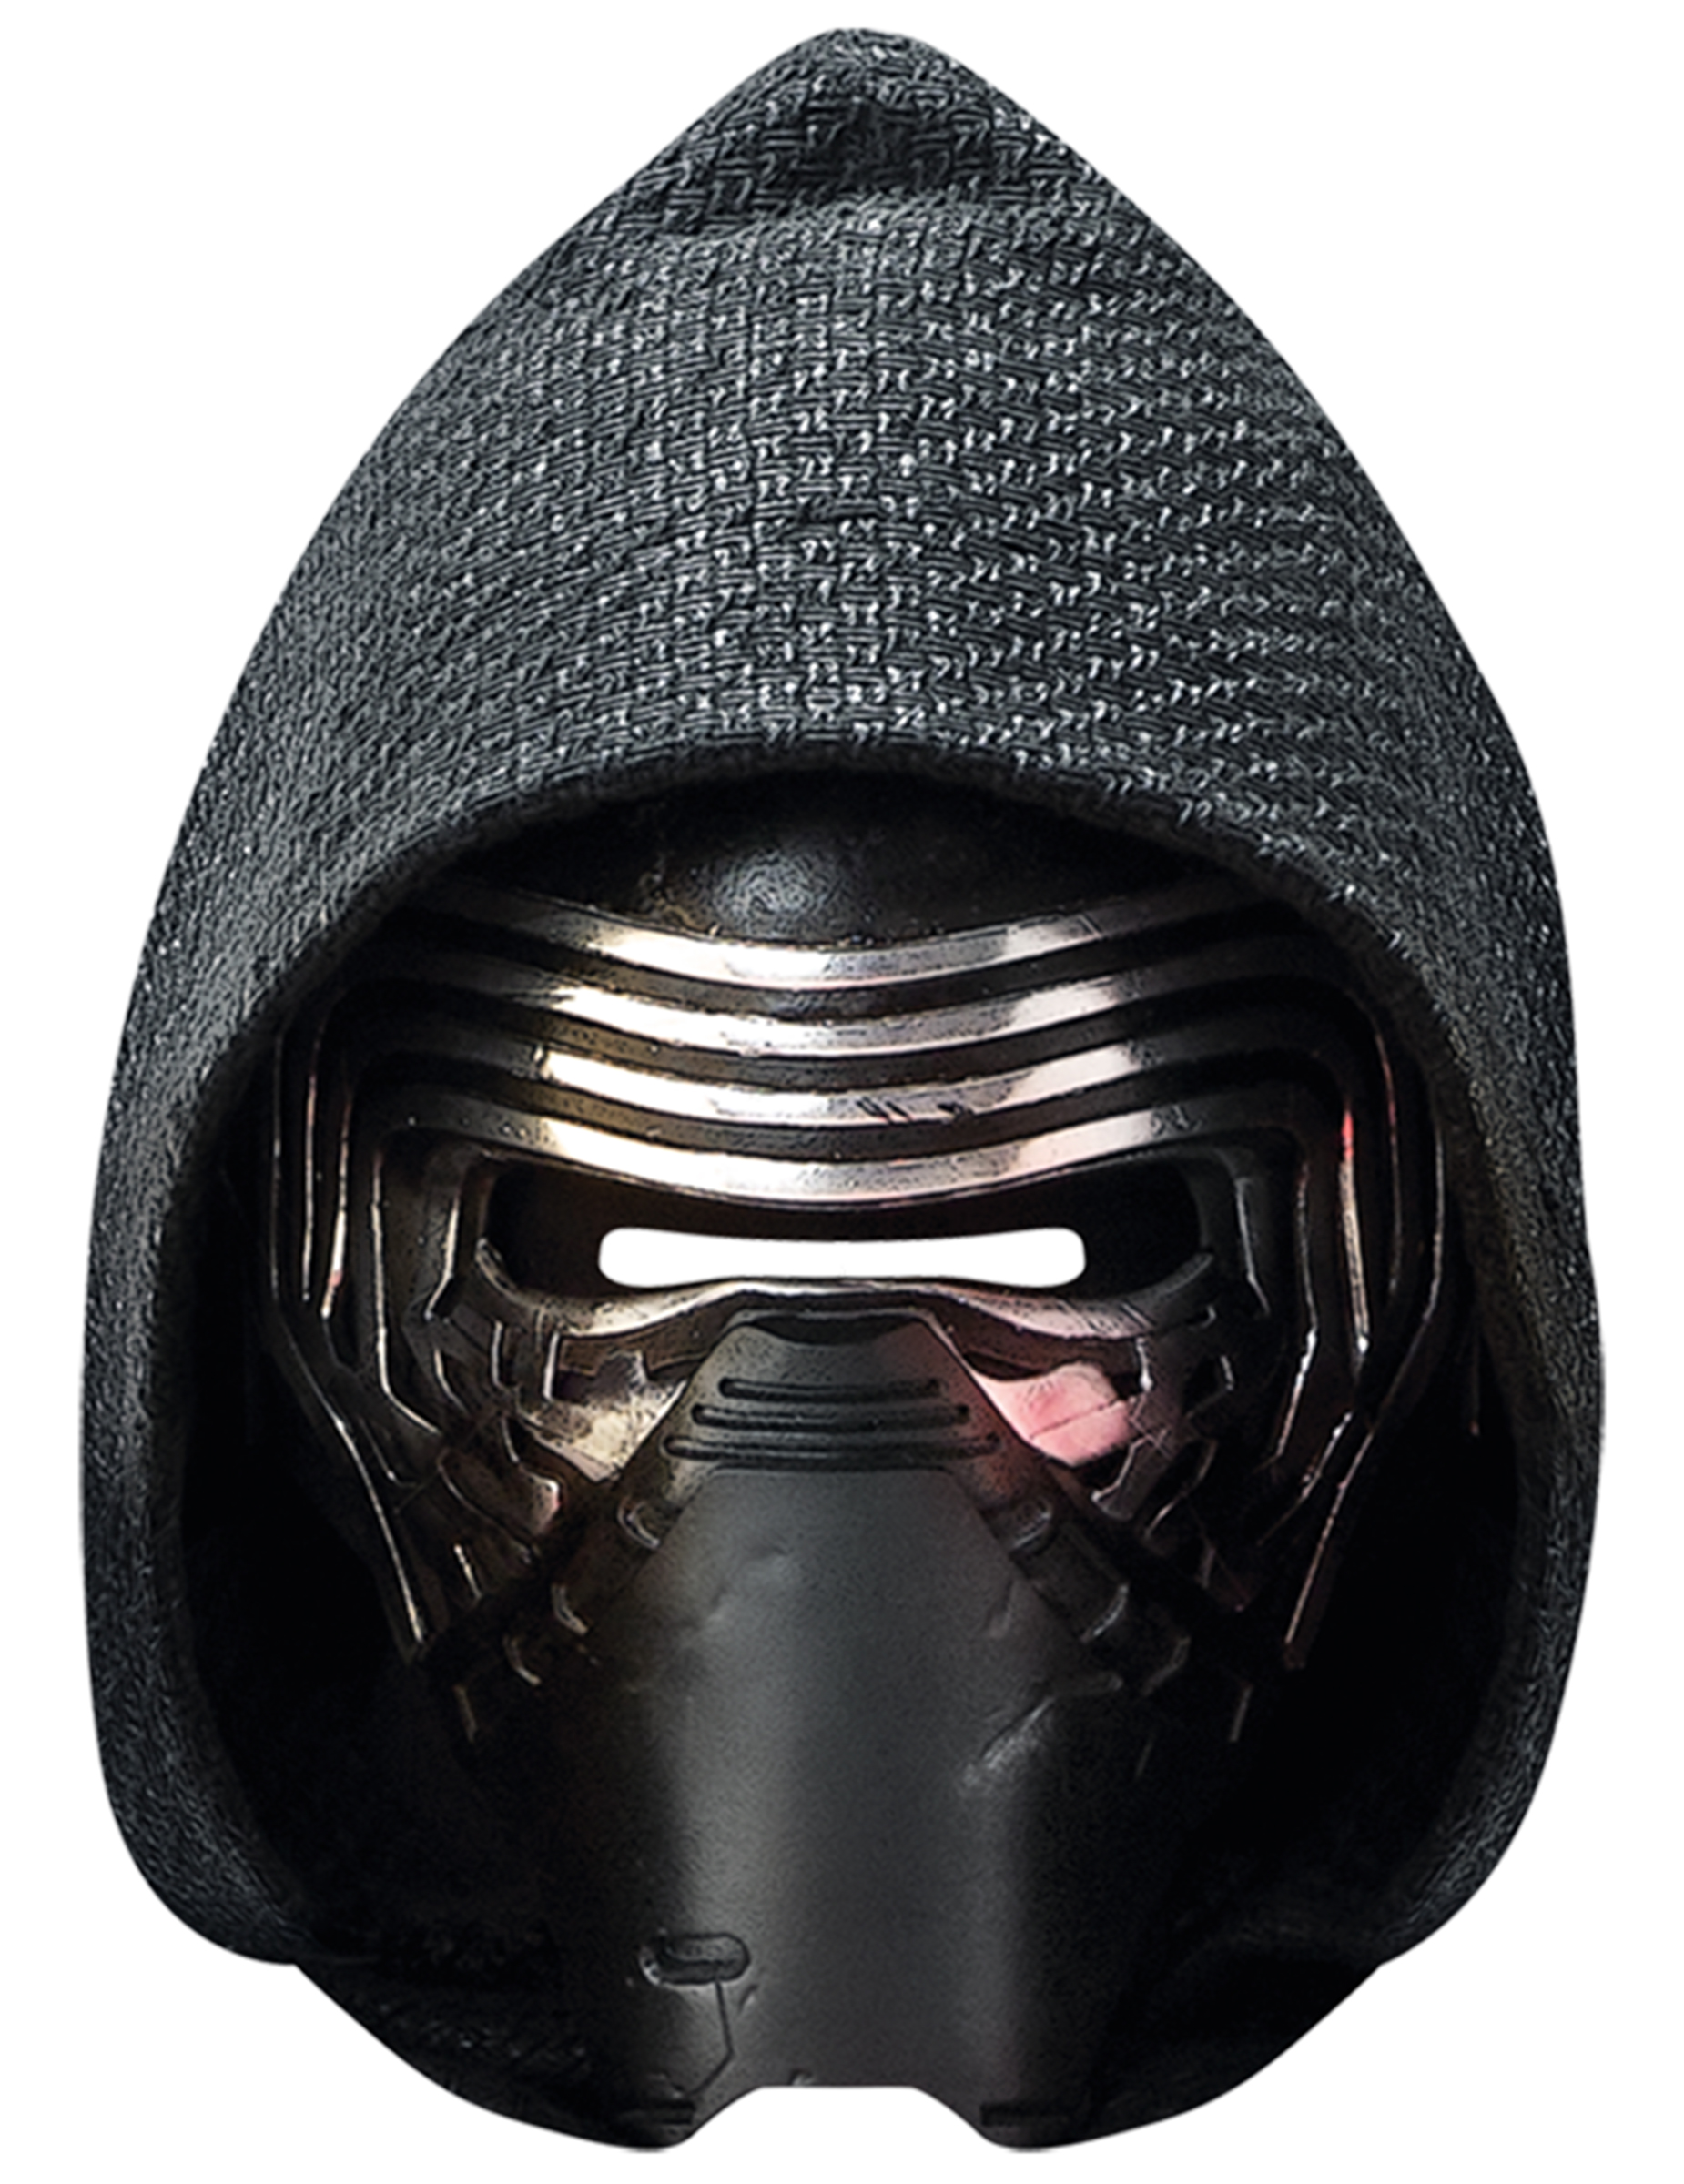 Kylo Ren Star Wars Vii The Force Awakens Masker